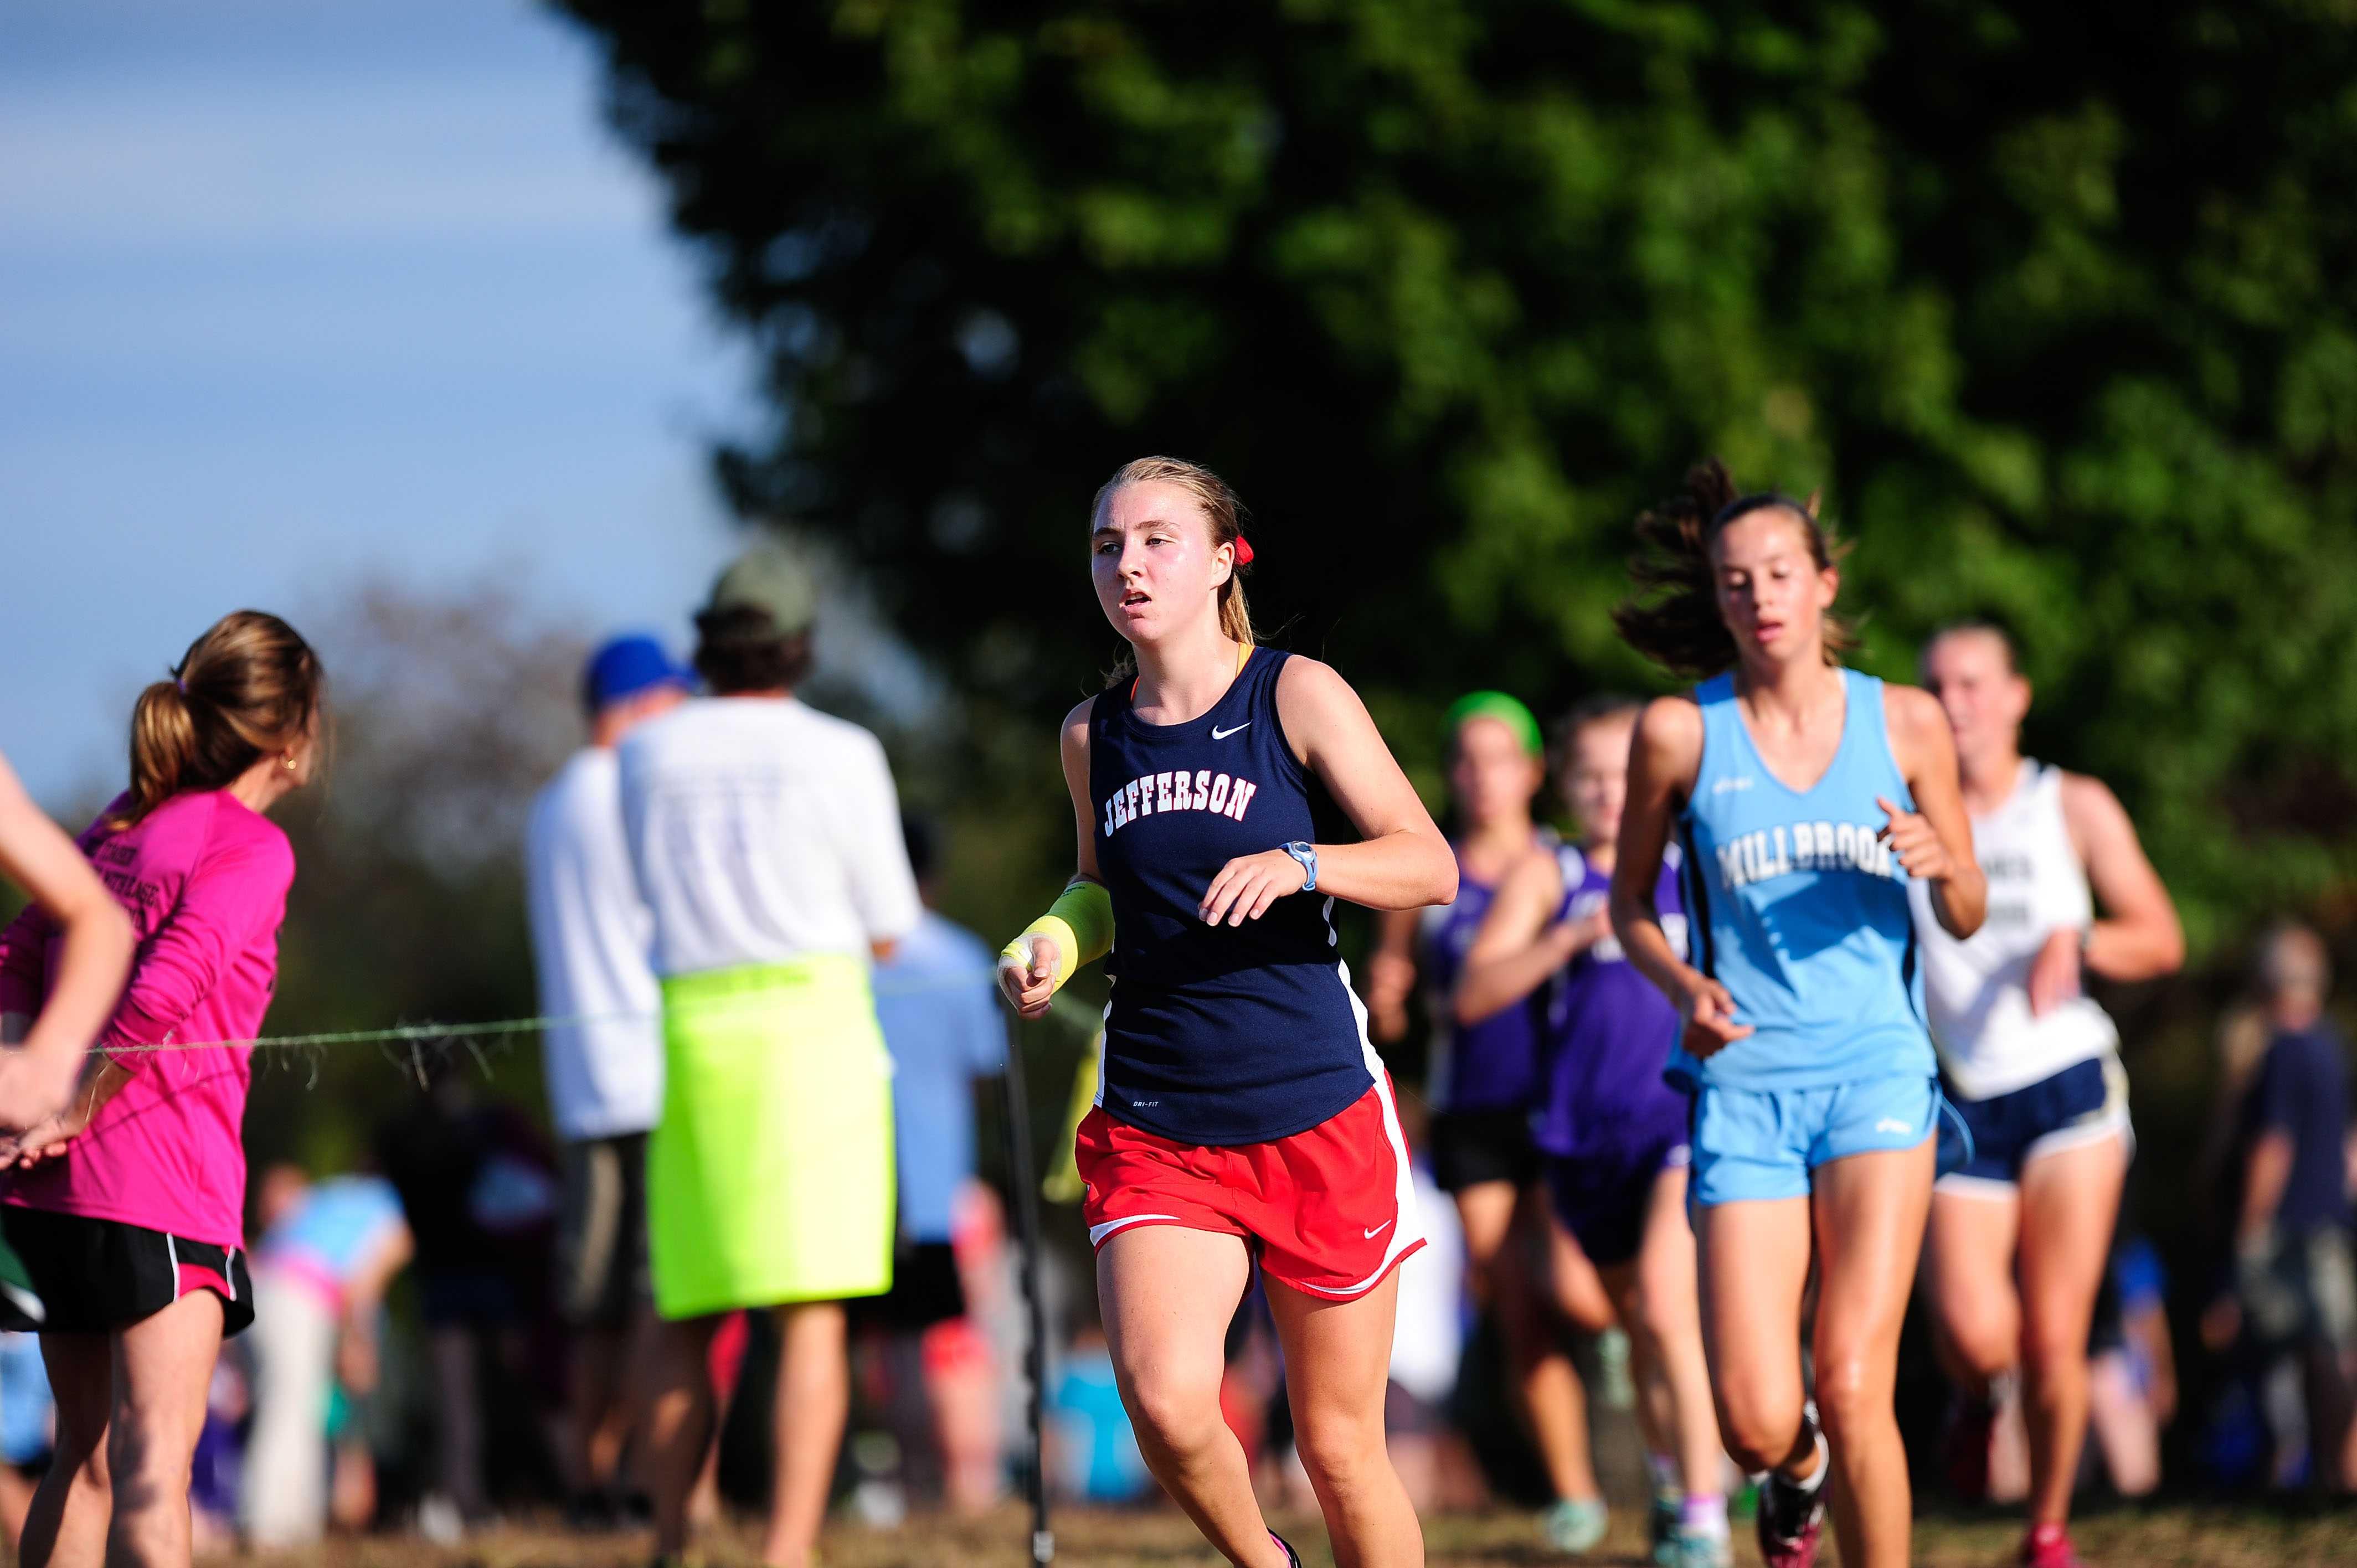 Junior Haley Stumvoll was Jefferson's first finisher at the Octoberfest 2013 Invitational.